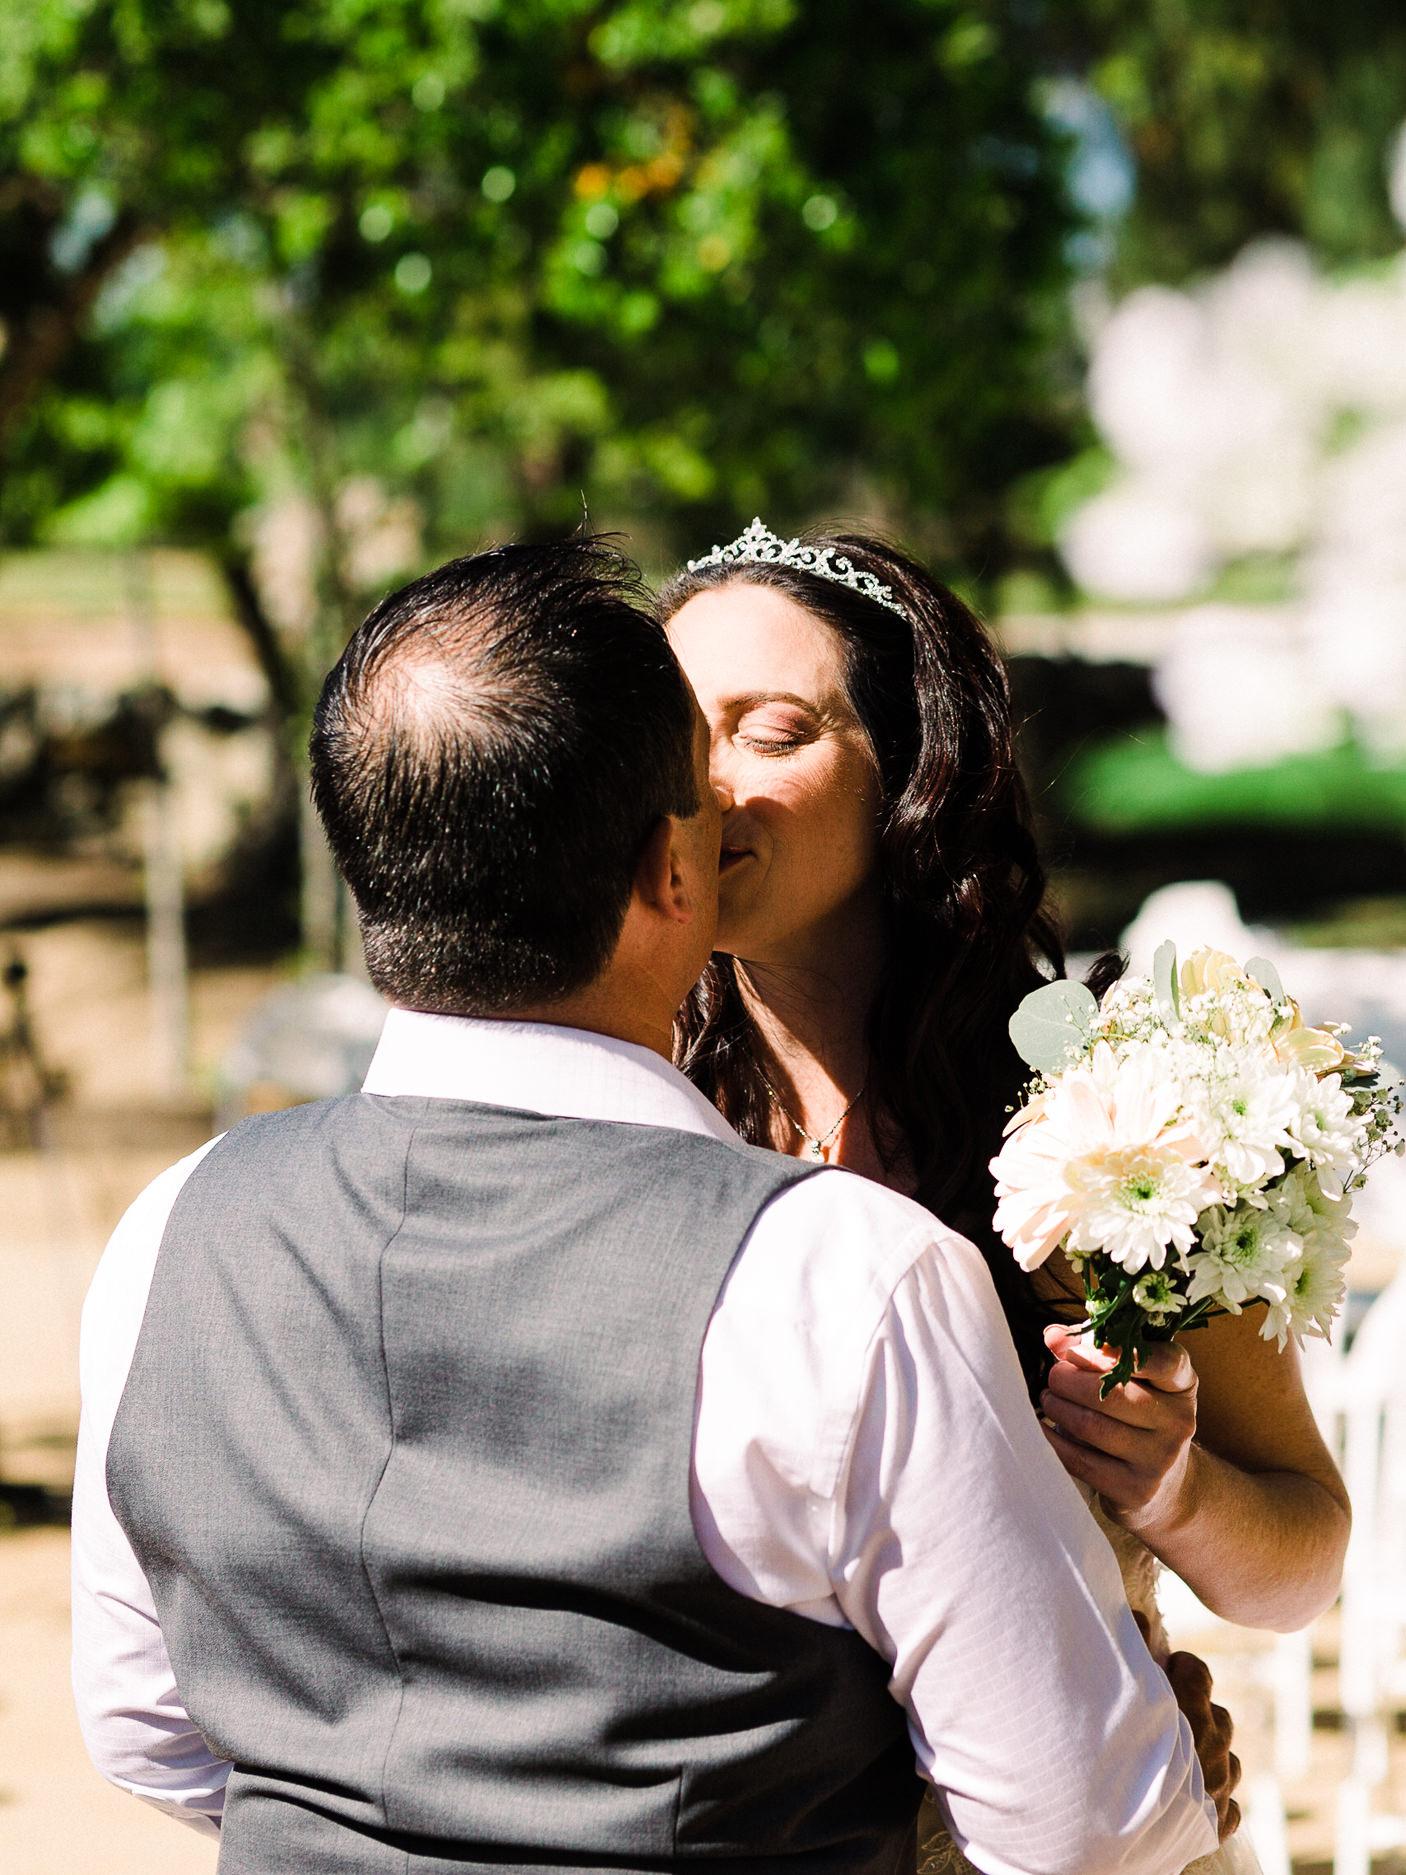 Tucolota Vineyard Temecula Wedding Photographs and Tucolota Vineyard Temecula Wedding Photography from Fine Art Family Photographer, engagement photographer and Wedding Photographer Daniel Doty Photography.